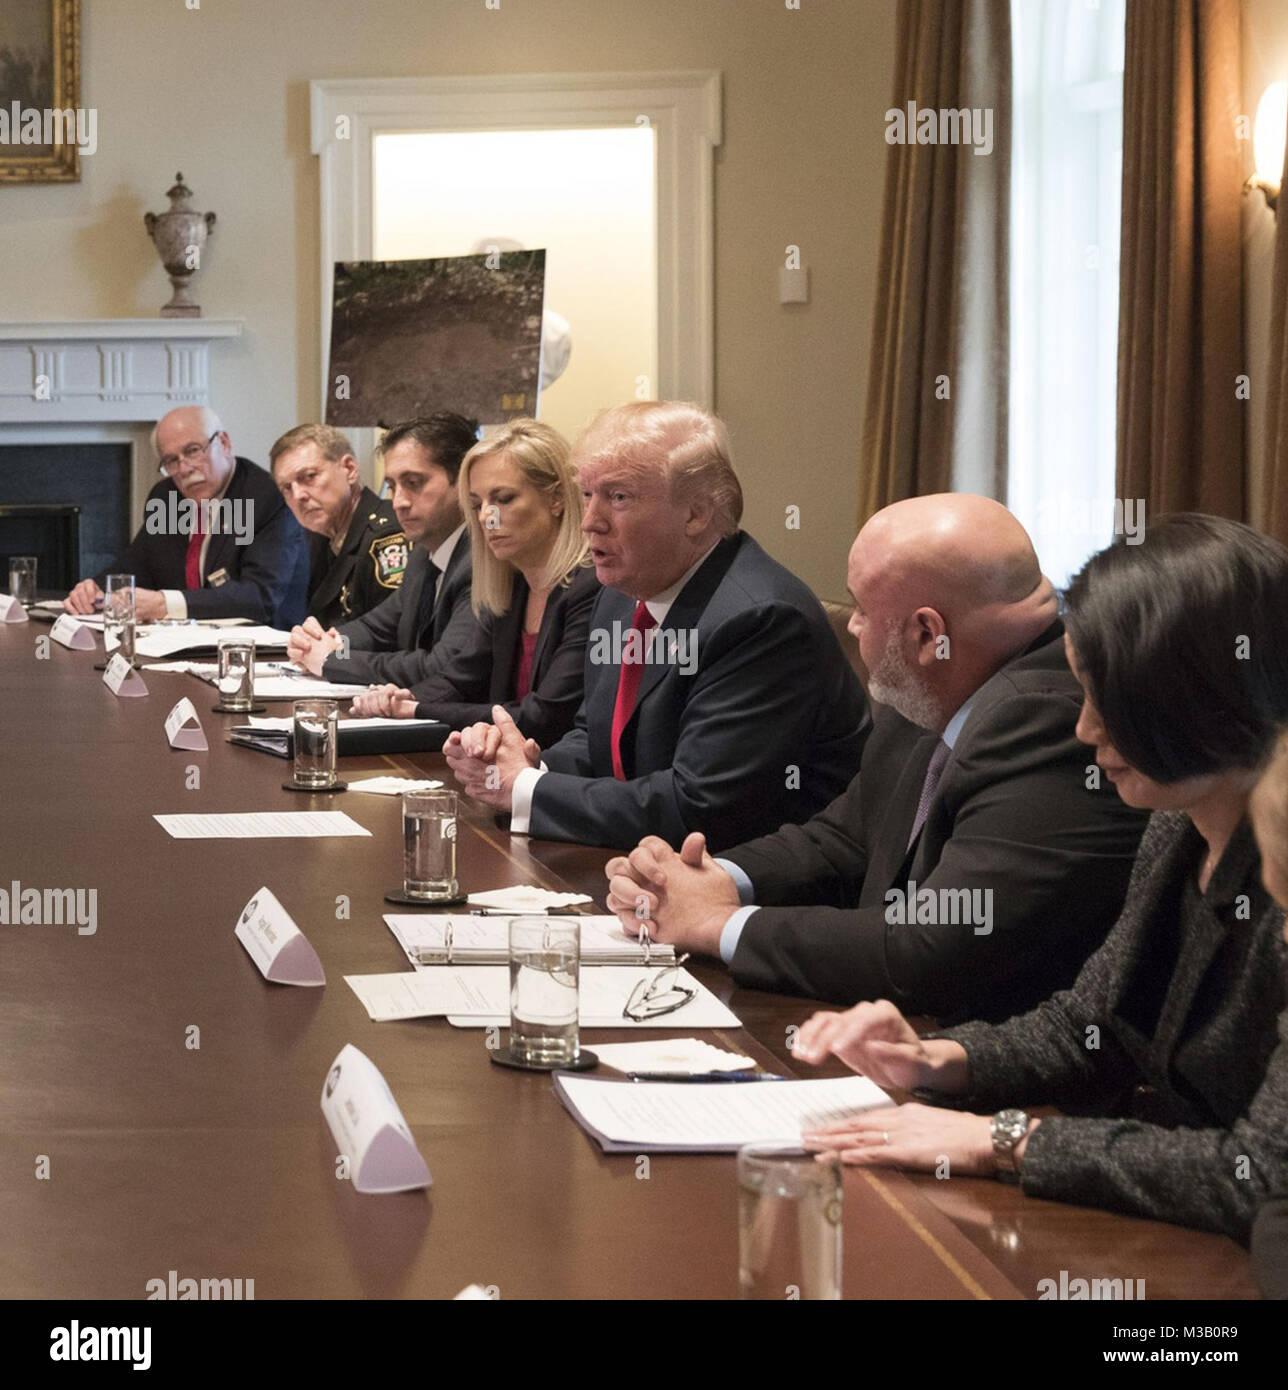 WASHINGTON, DC - FEBRUARY 06: President Donald J. Trump, joined by U.S. Secretary of Homeland Security Kirstjen - Stock Image